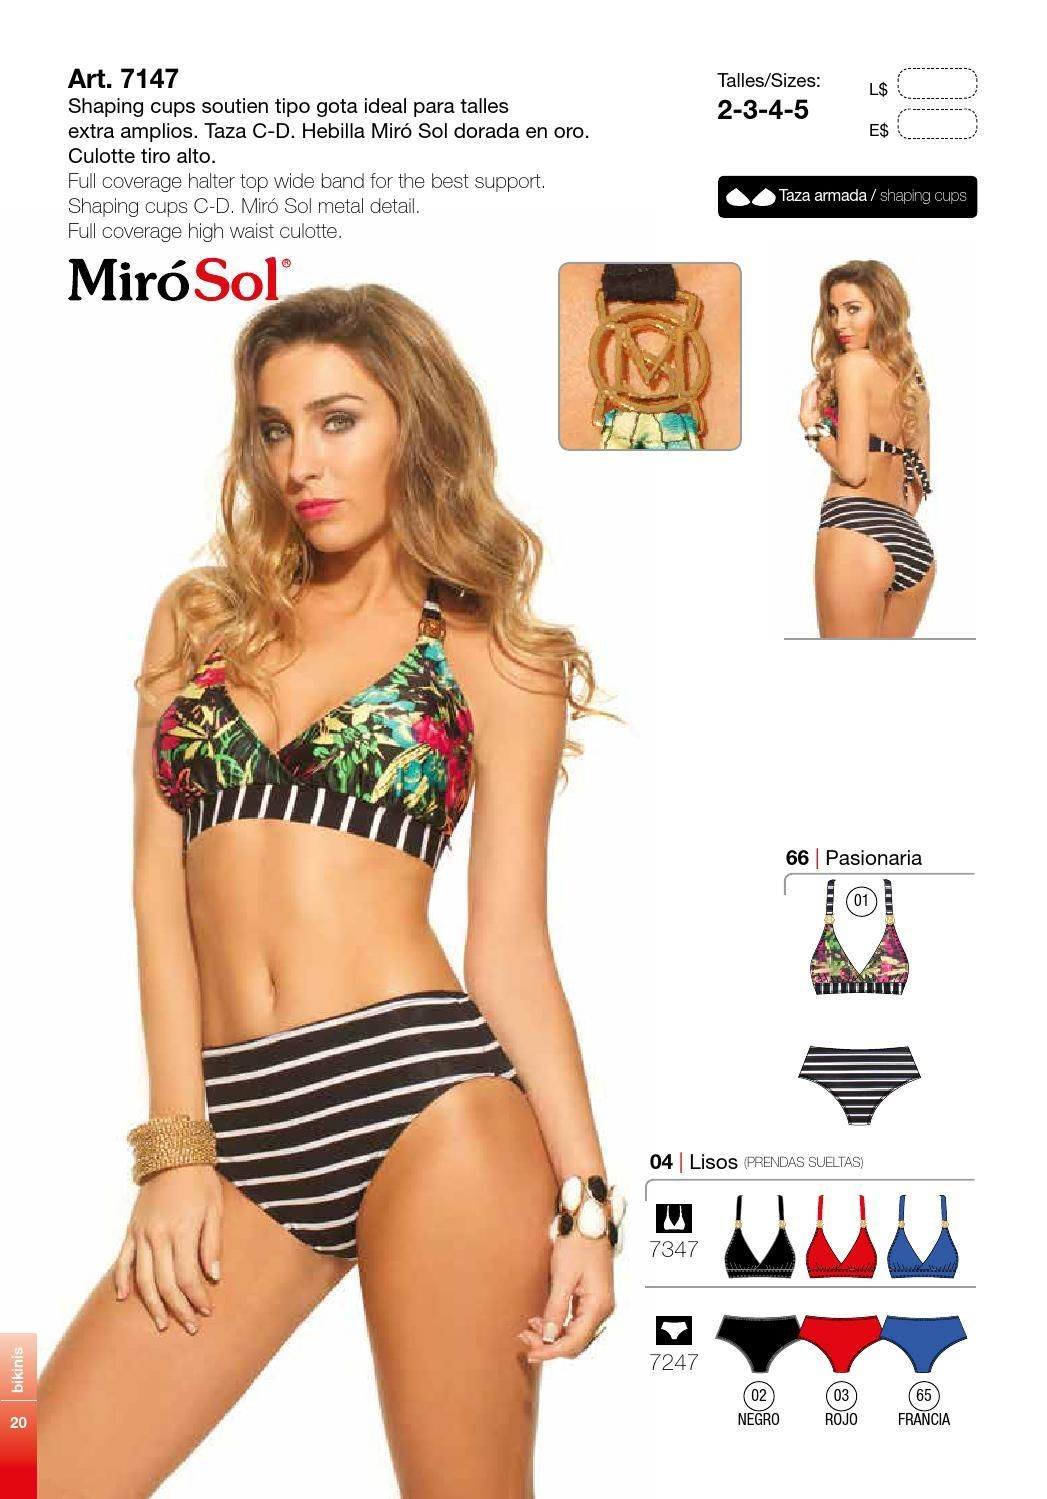 d5b911571754 Catalogo Miro Sol 2015 | swimwear+ women 2000-3000+1 | Fashion ...